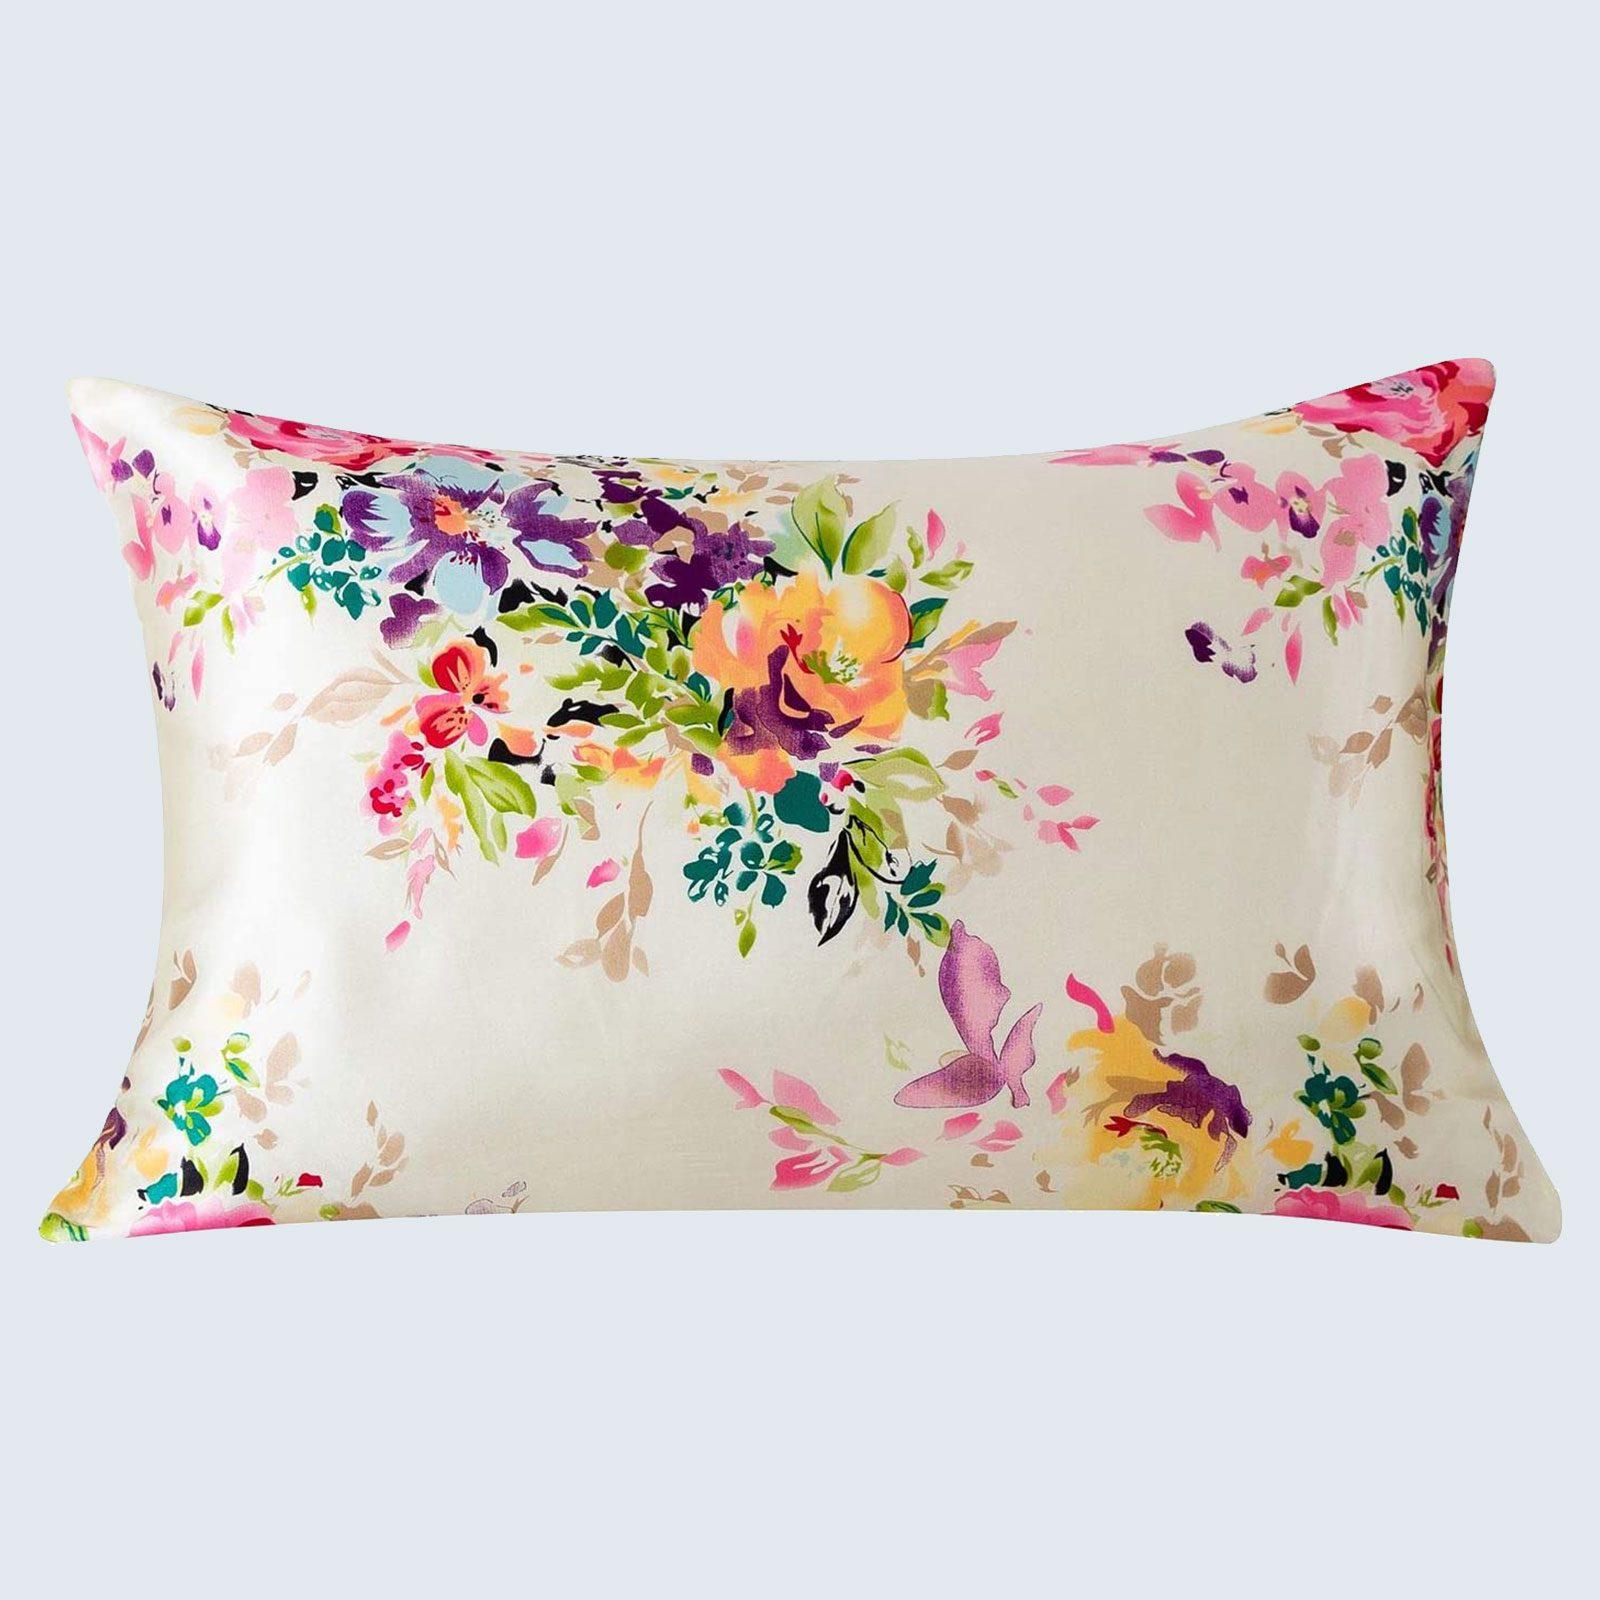 For the sleep-deprived: SLPBABY Silk Pillowcase